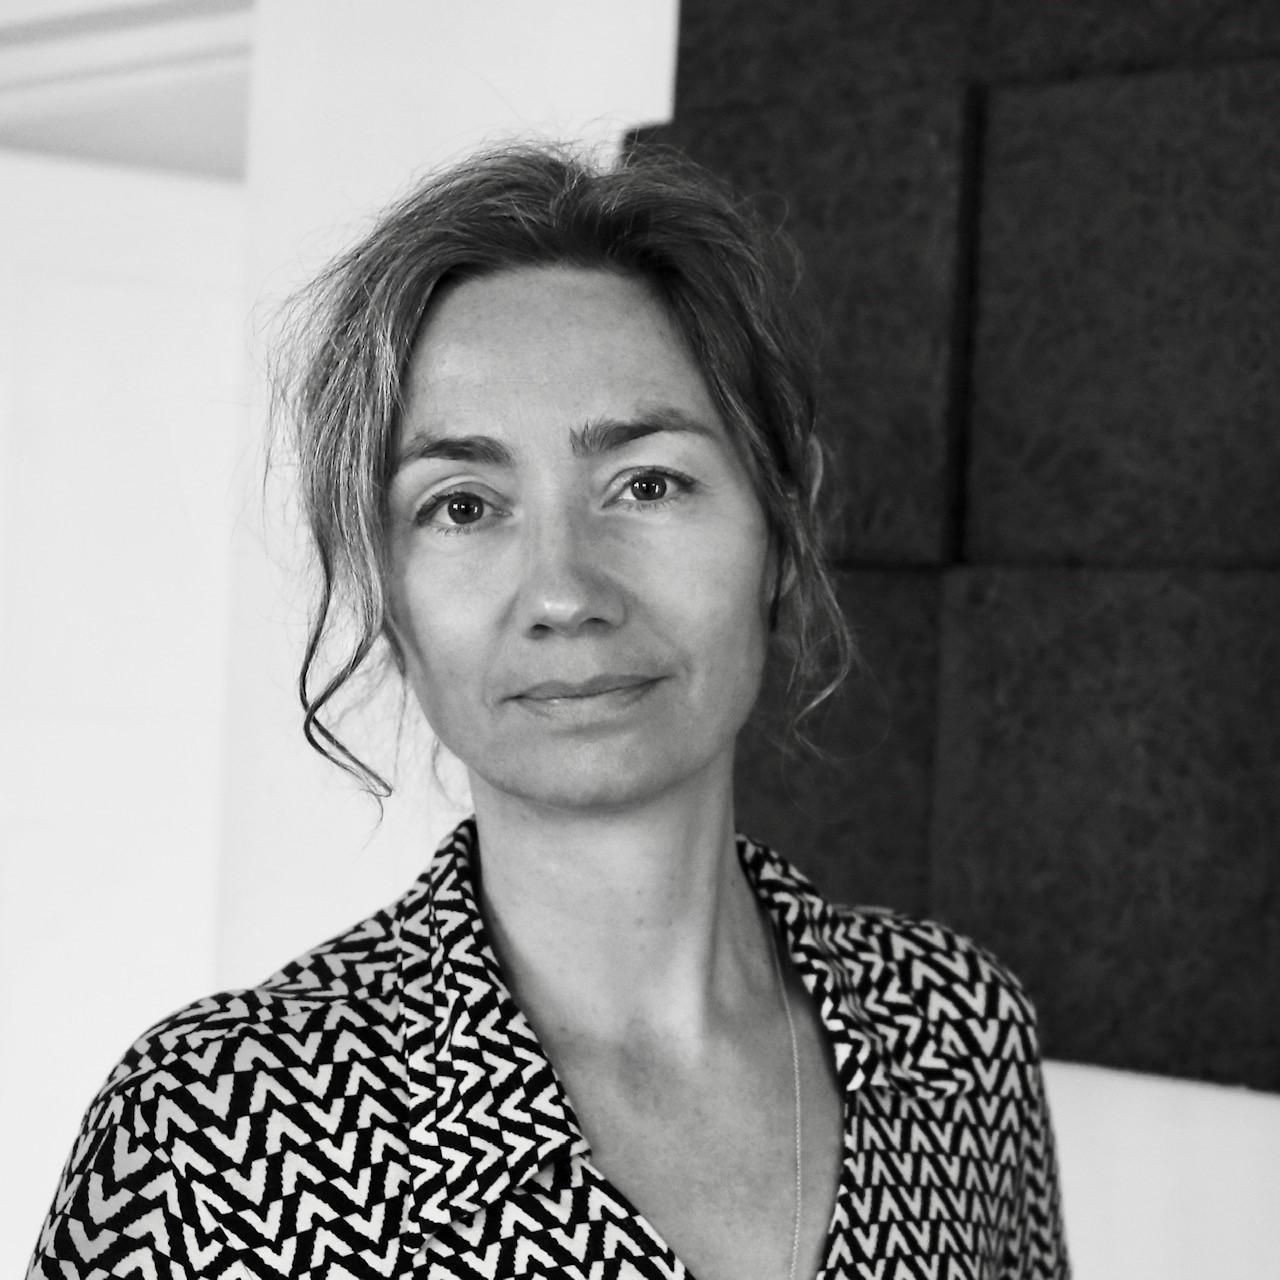 Eva Gjessing